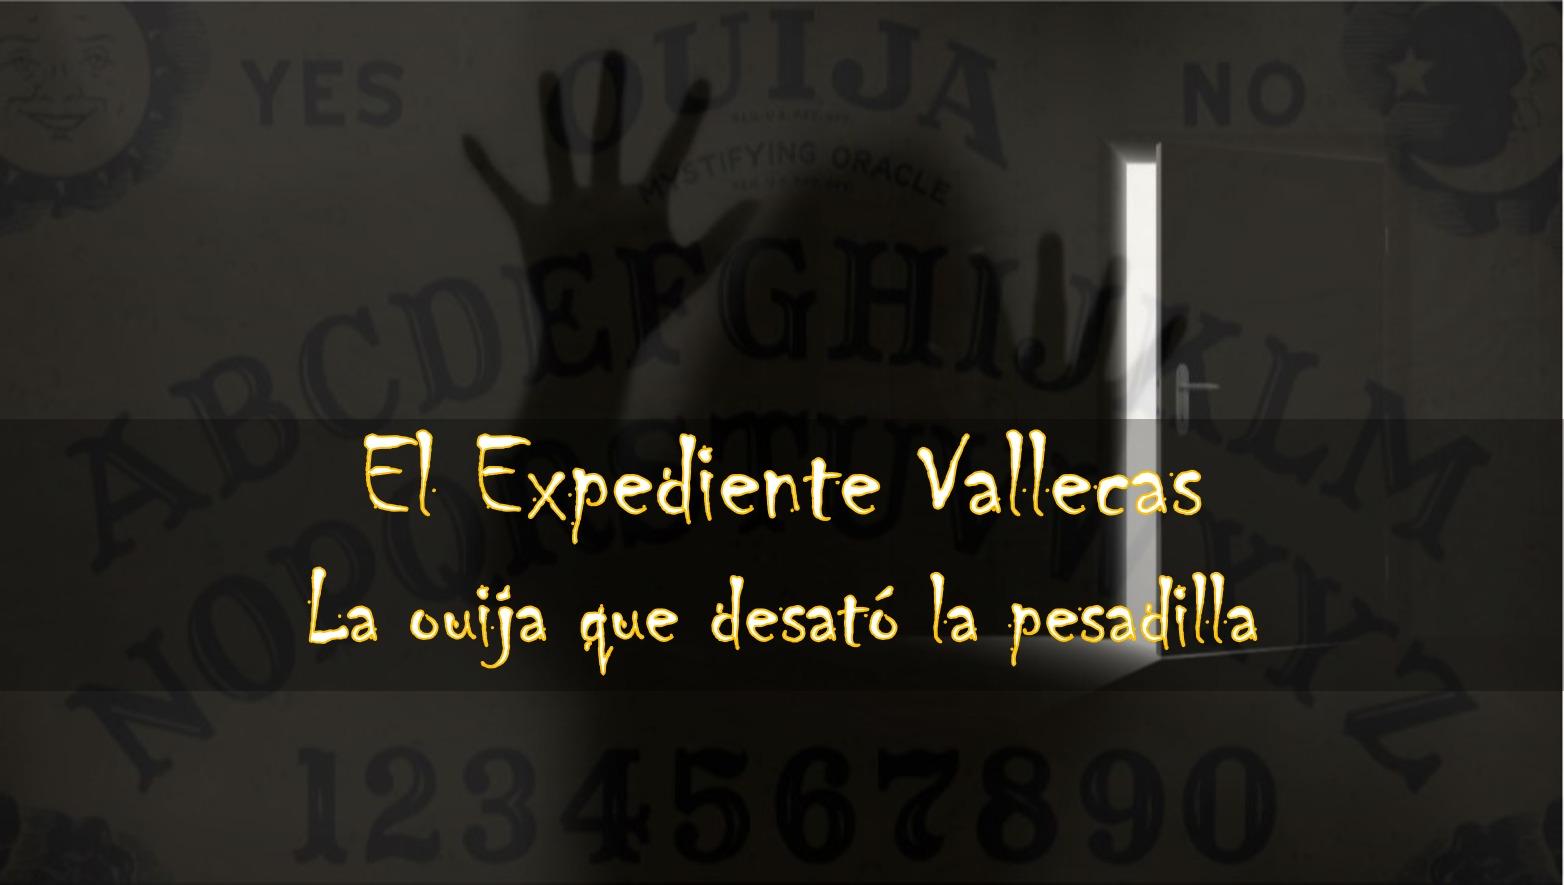 caso vallecas-estefania gutierrez lazaro-fenomenos paranormales-fantasmas-espiritus-ouija